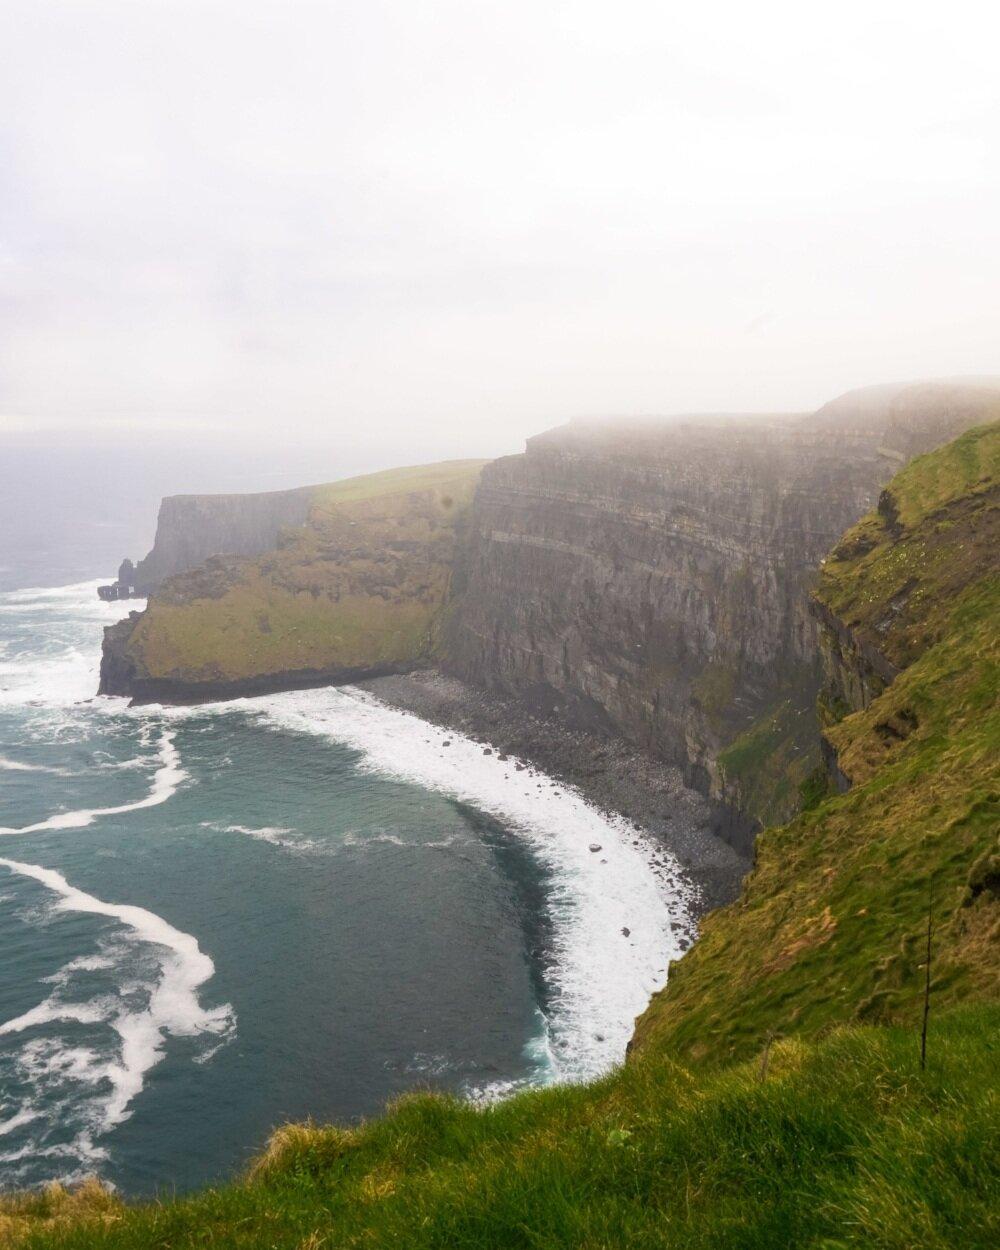 curio.trips.ireland.cliffs.of.moher.bay.portrait.jpg